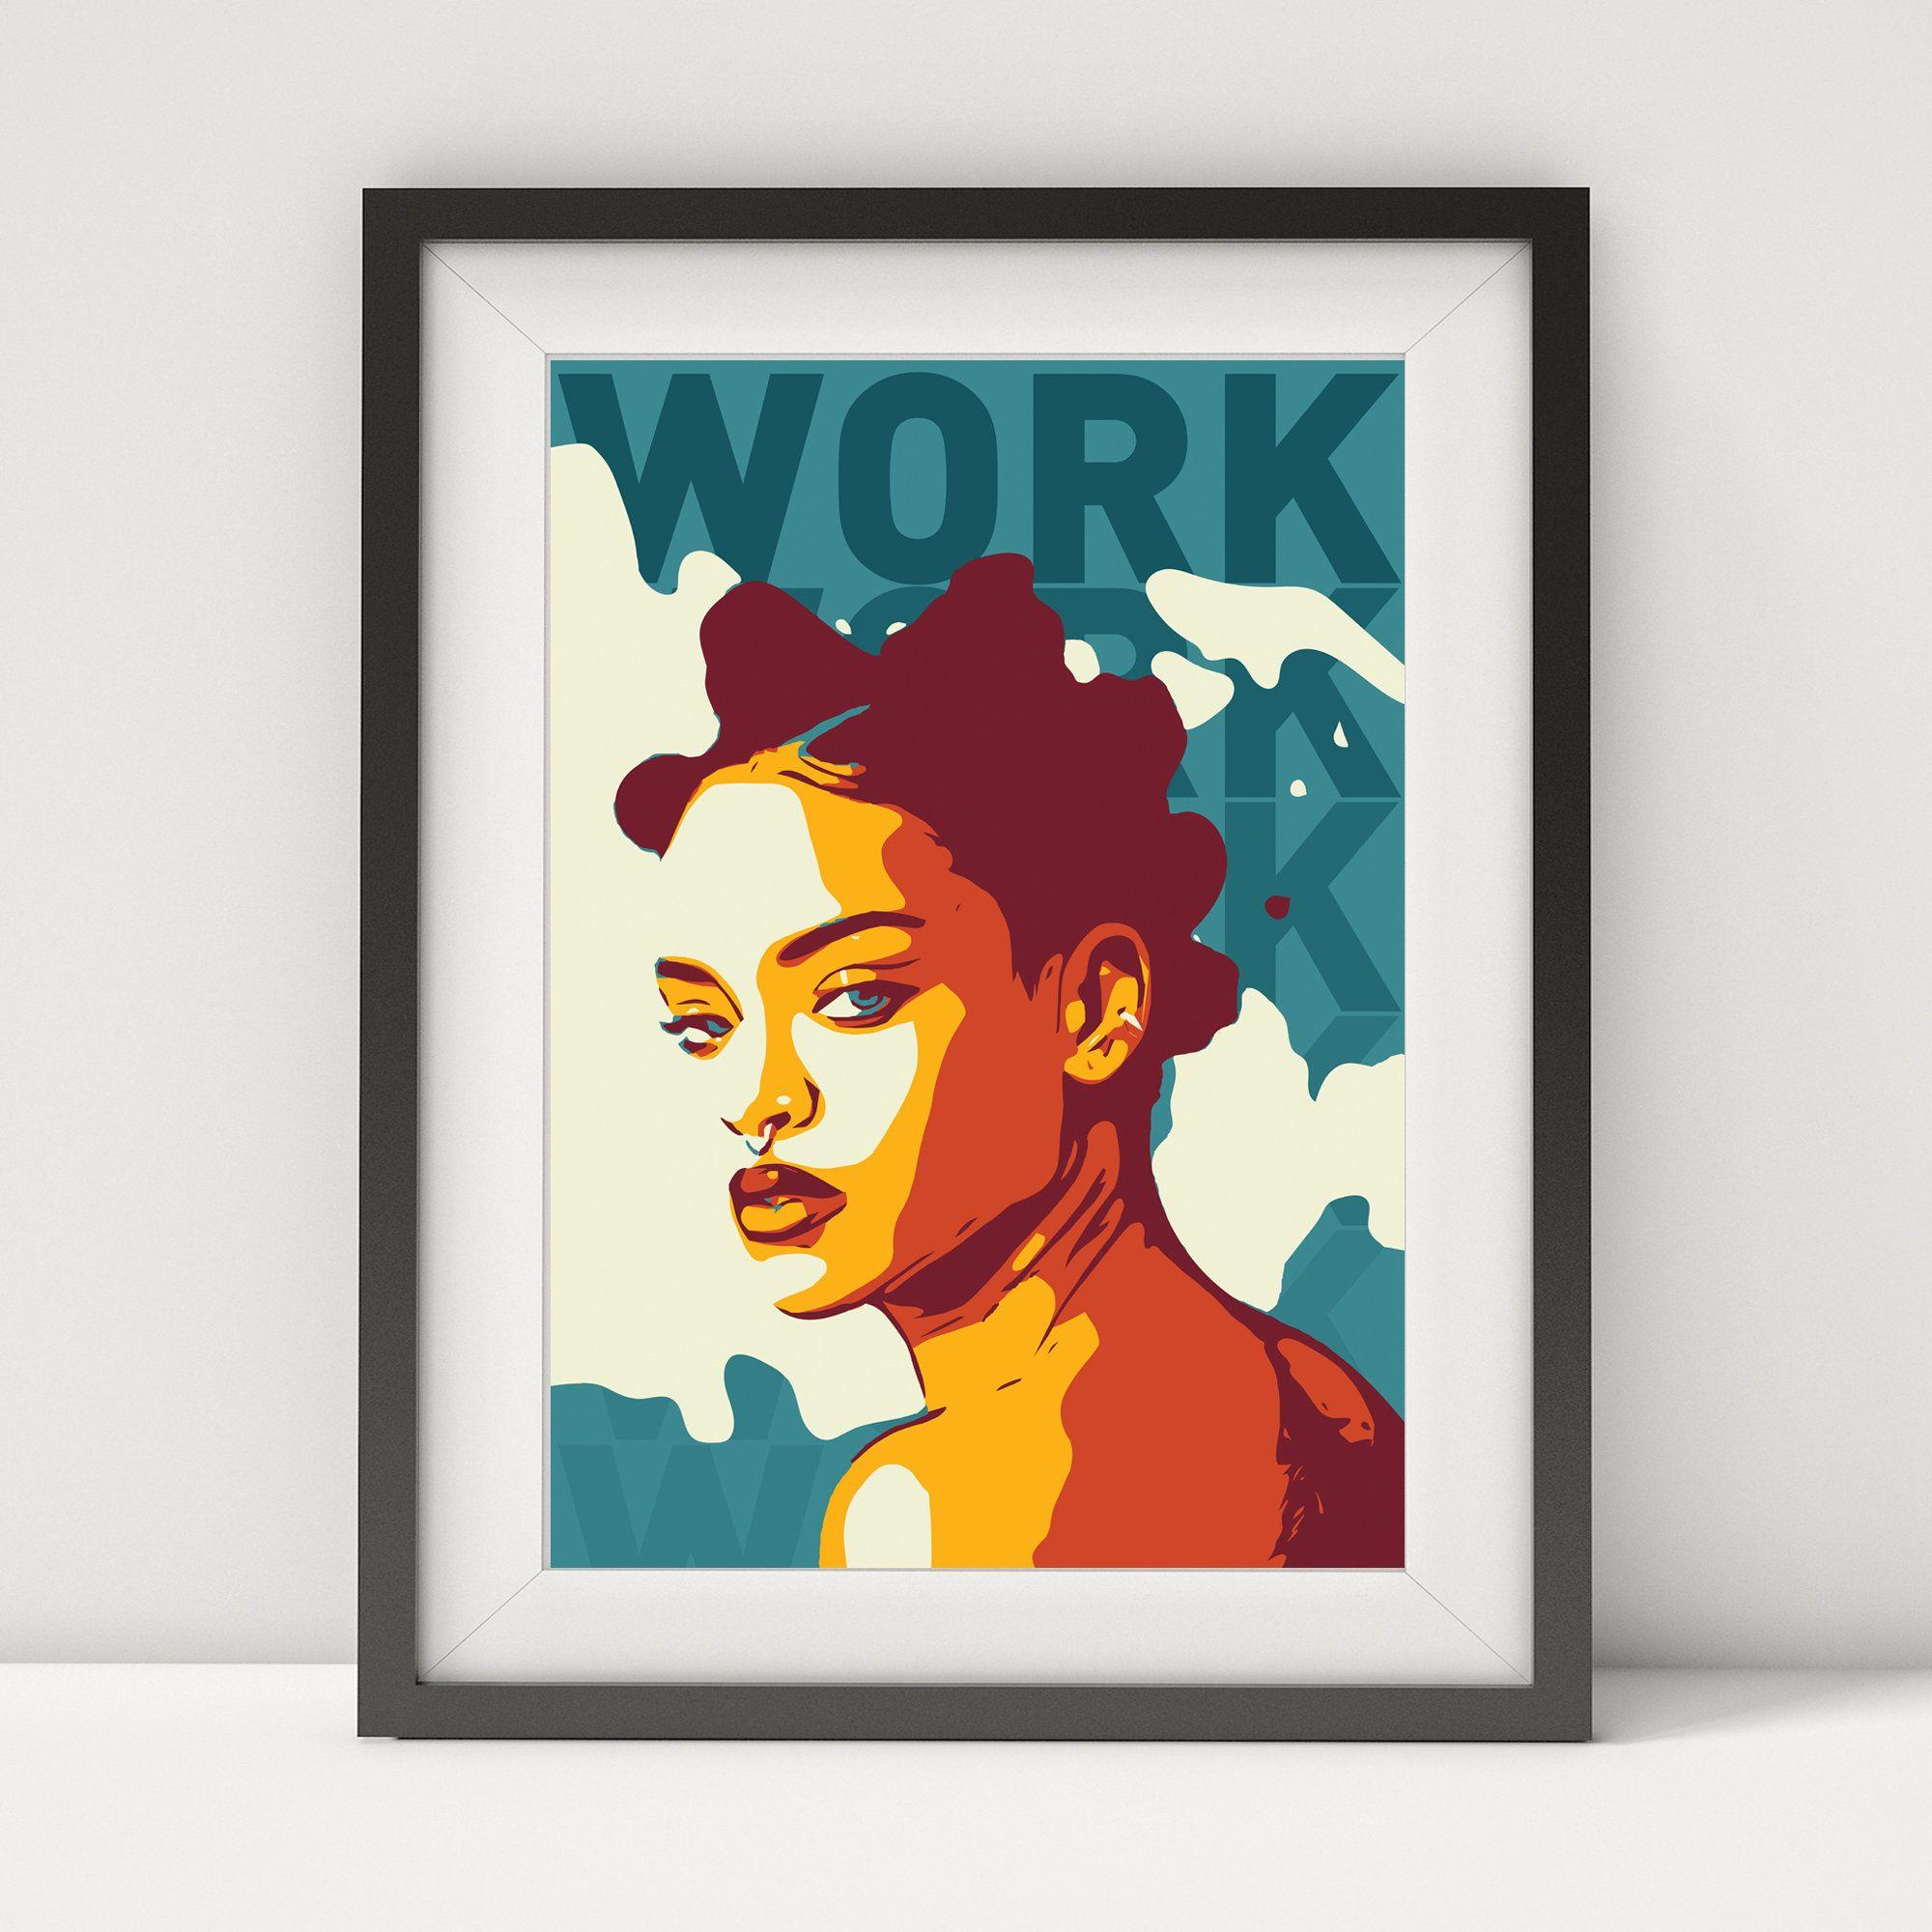 Rihanna Rihanna Poster Rihanna Art Music Poster Pop Poster Rihanna Quote Lyrics Poster Prints Pop Art Wor Pop Posters Music Poster Music Poster Design